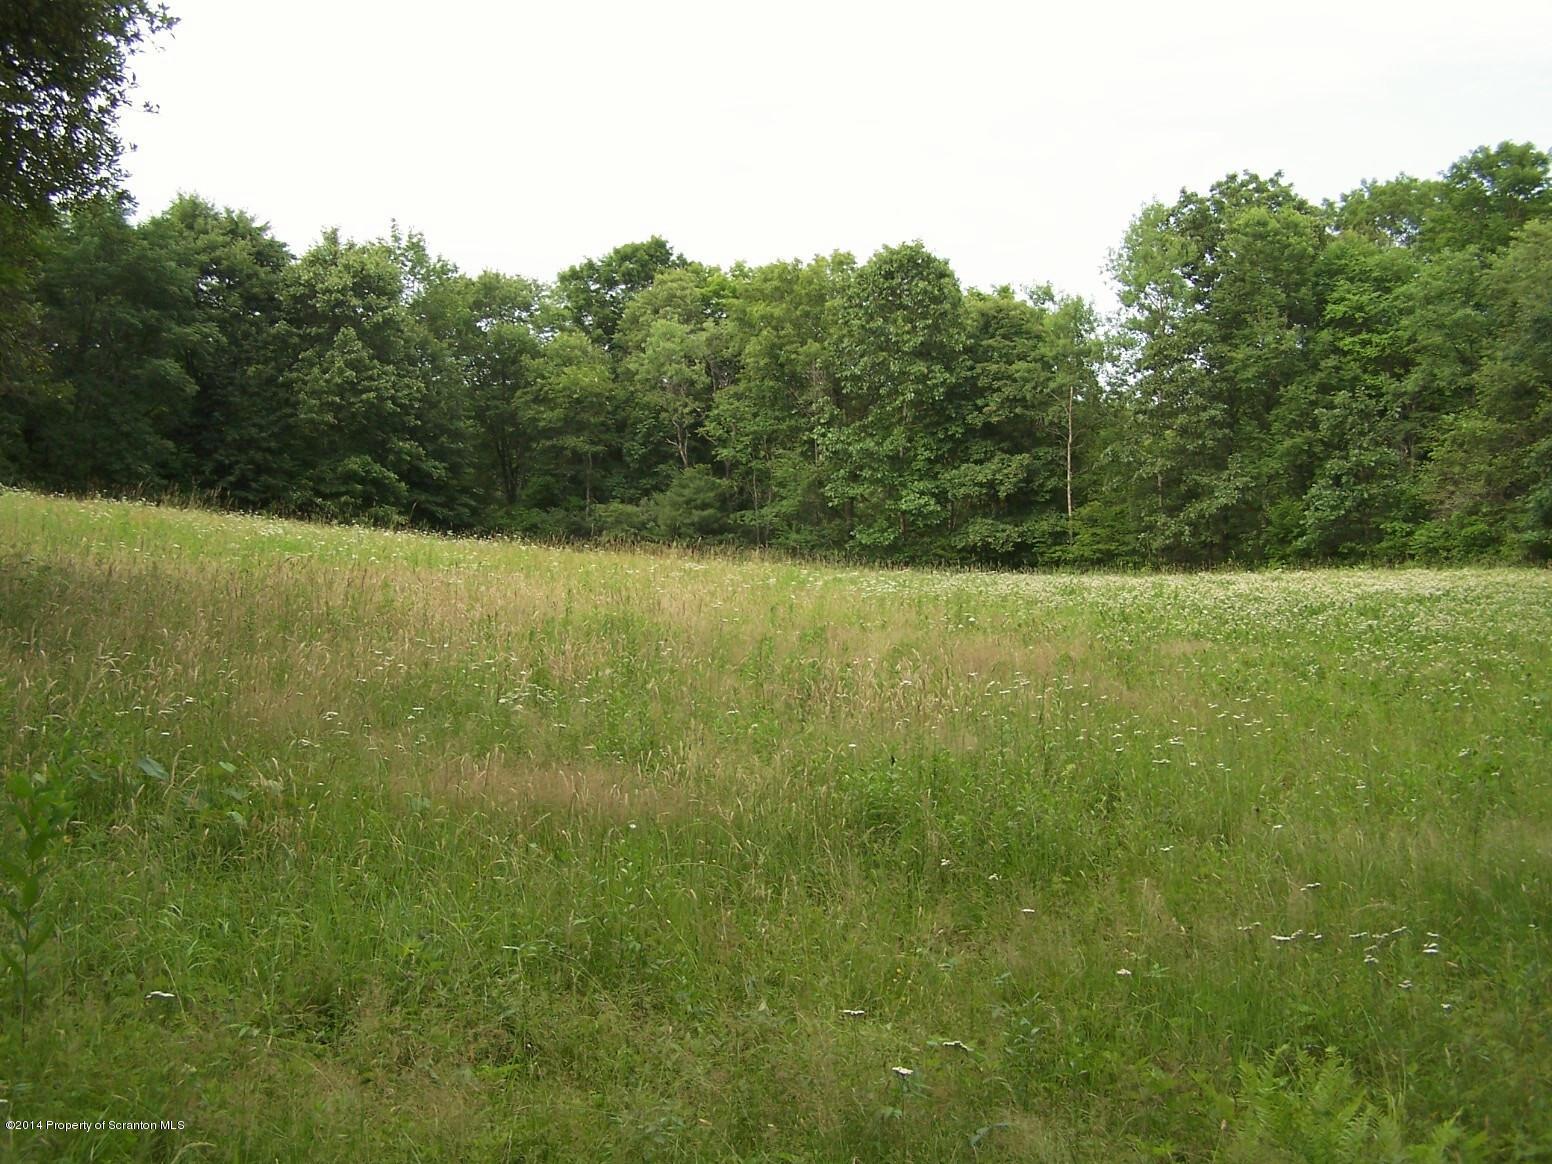 53 SWEET VALLEY RD, Hunlock Creek, Pennsylvania 18621, ,Land,For Sale,SWEET VALLEY,14-3968